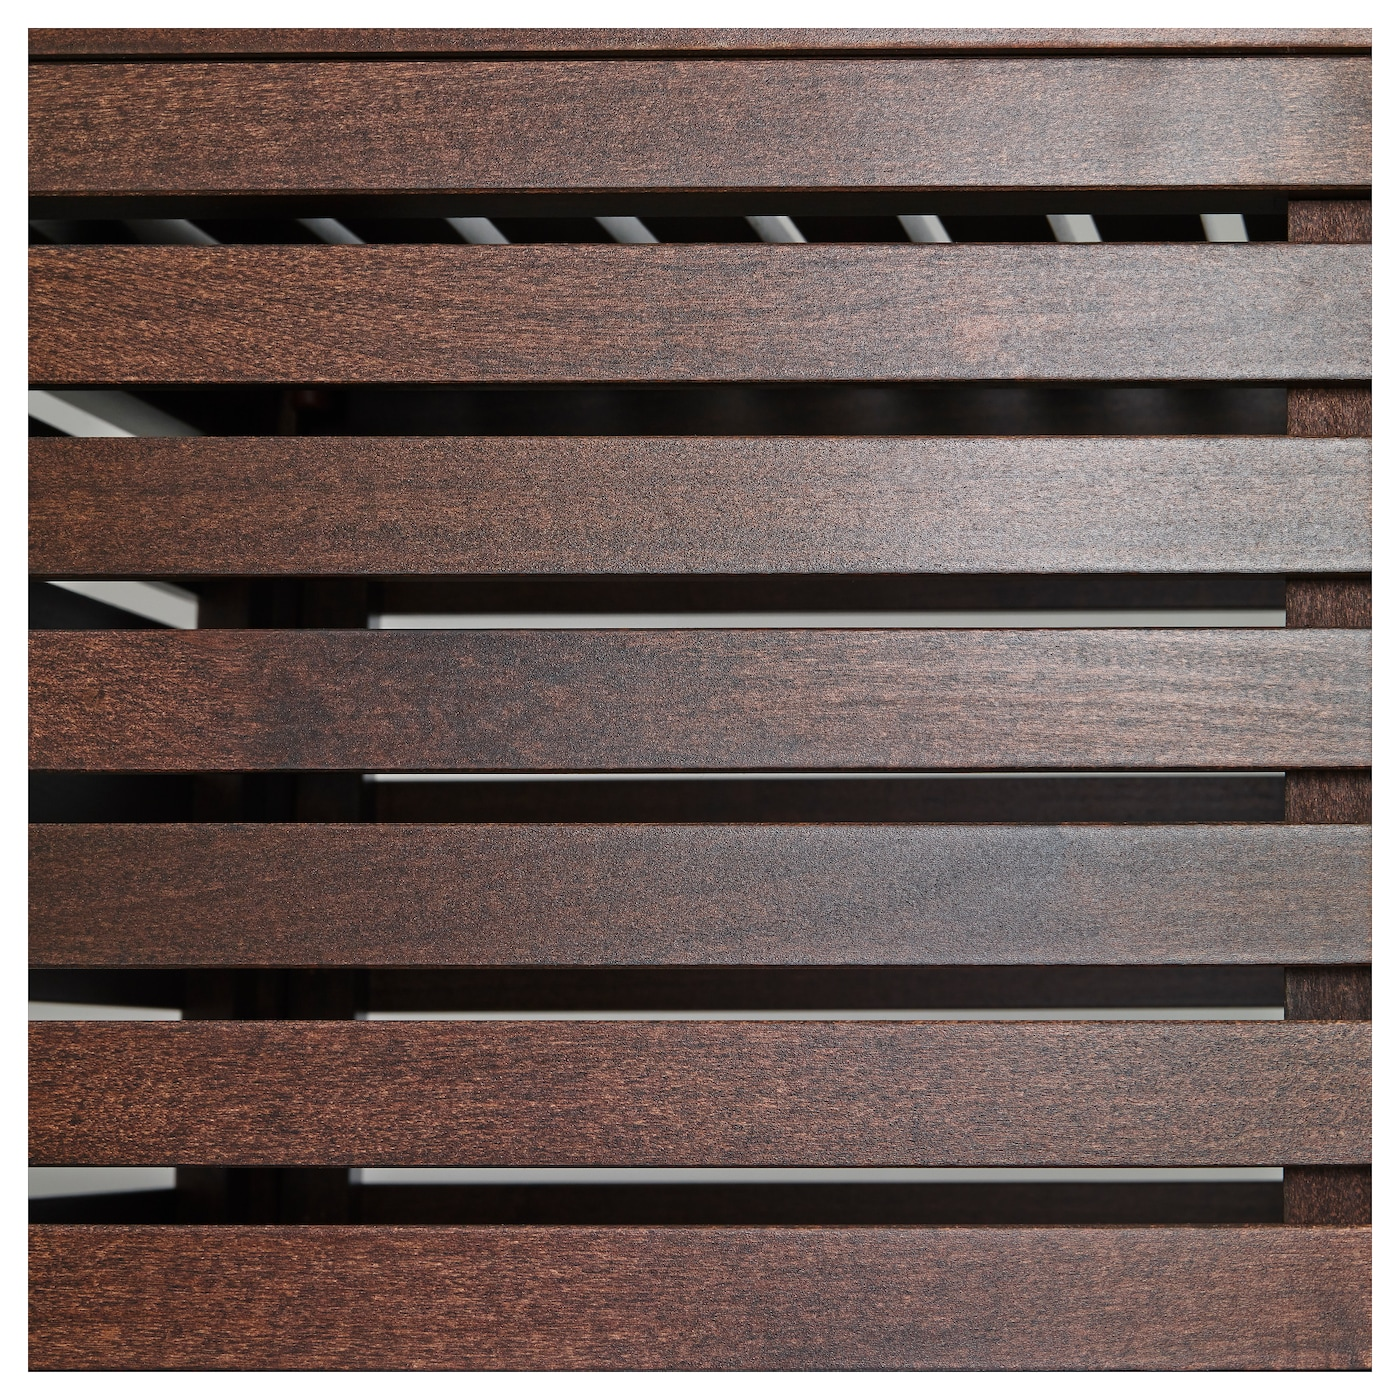 Oh My Experience Ikea Catalove 2014: MOLGER Storage Stool Dark Brown